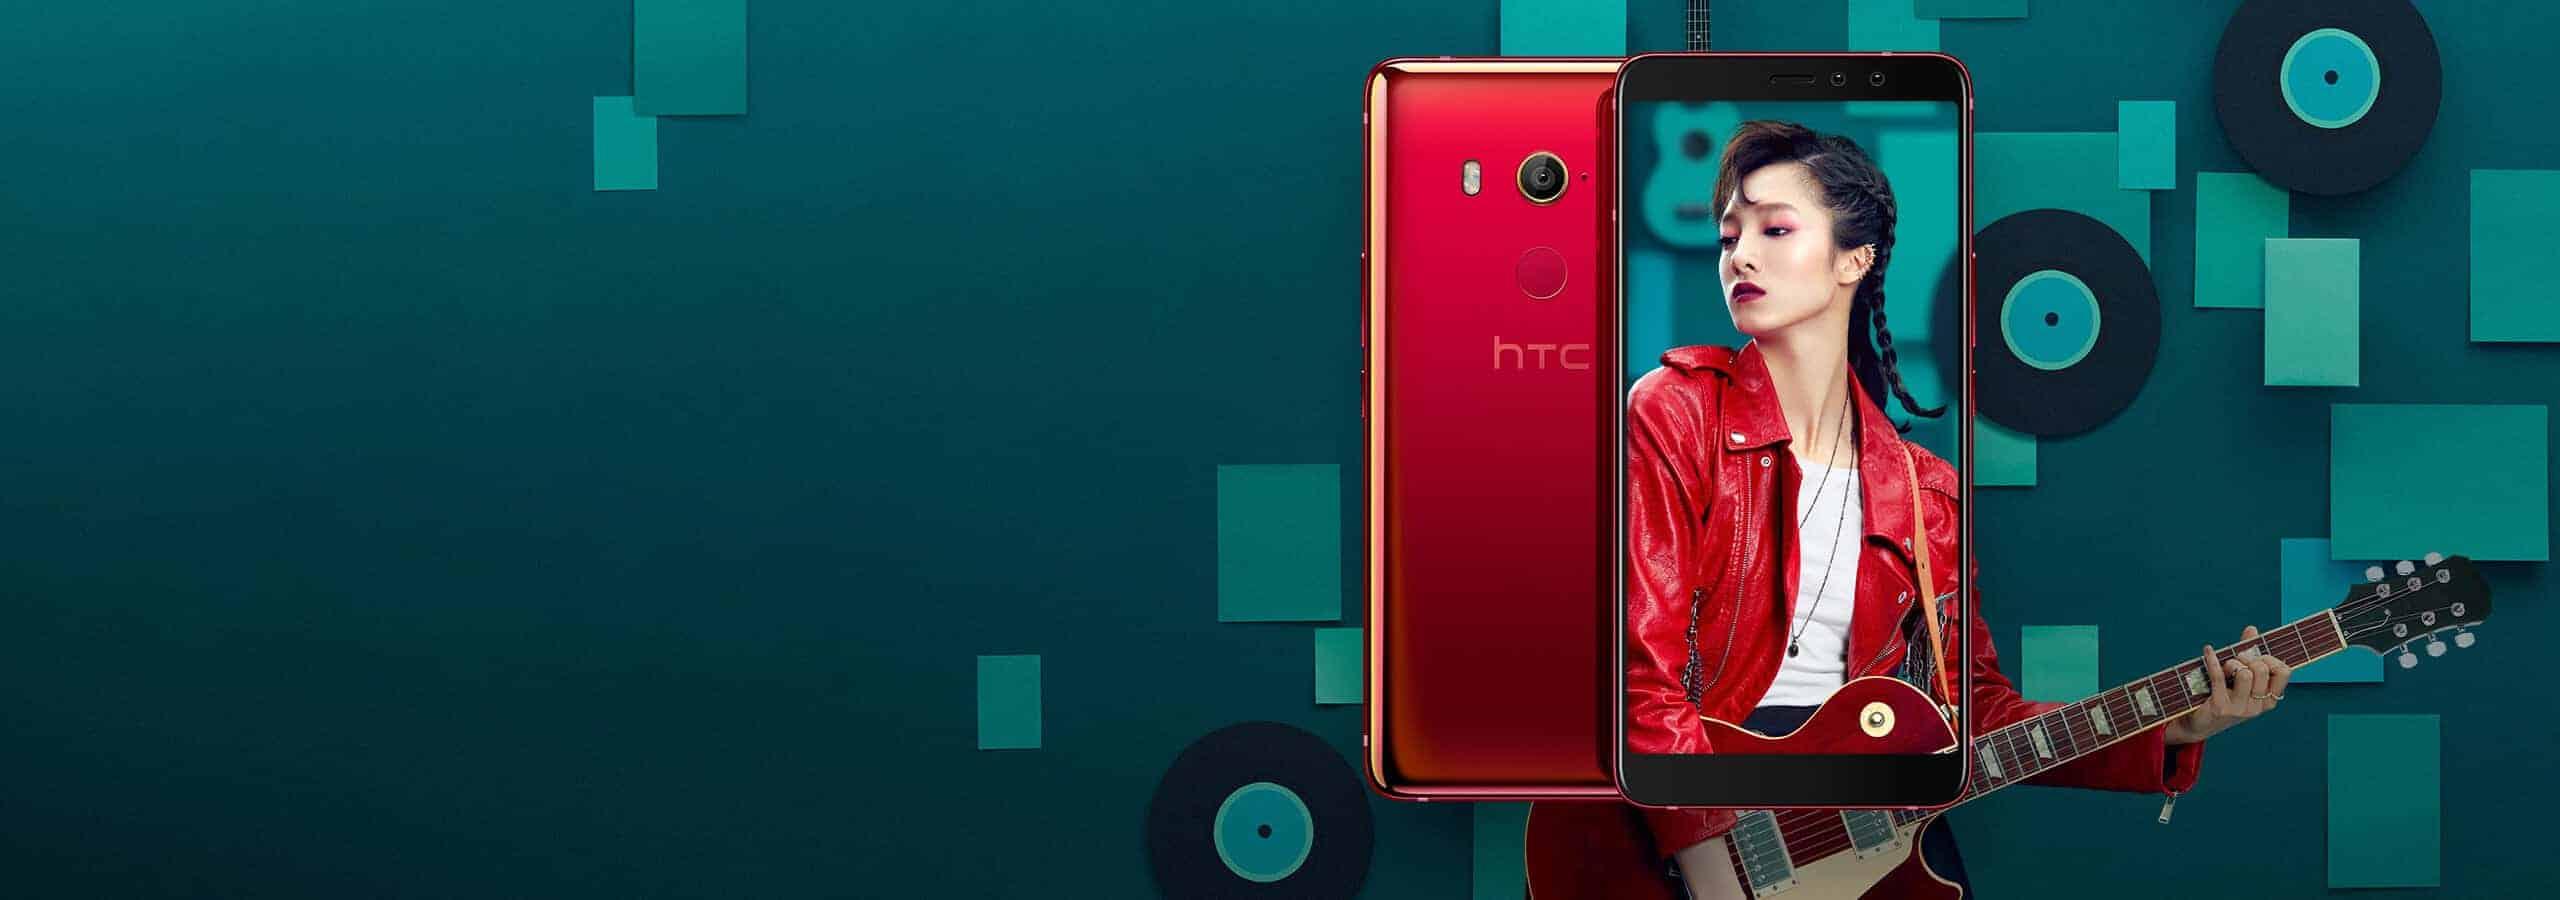 HTC U11 EYEs official image 1